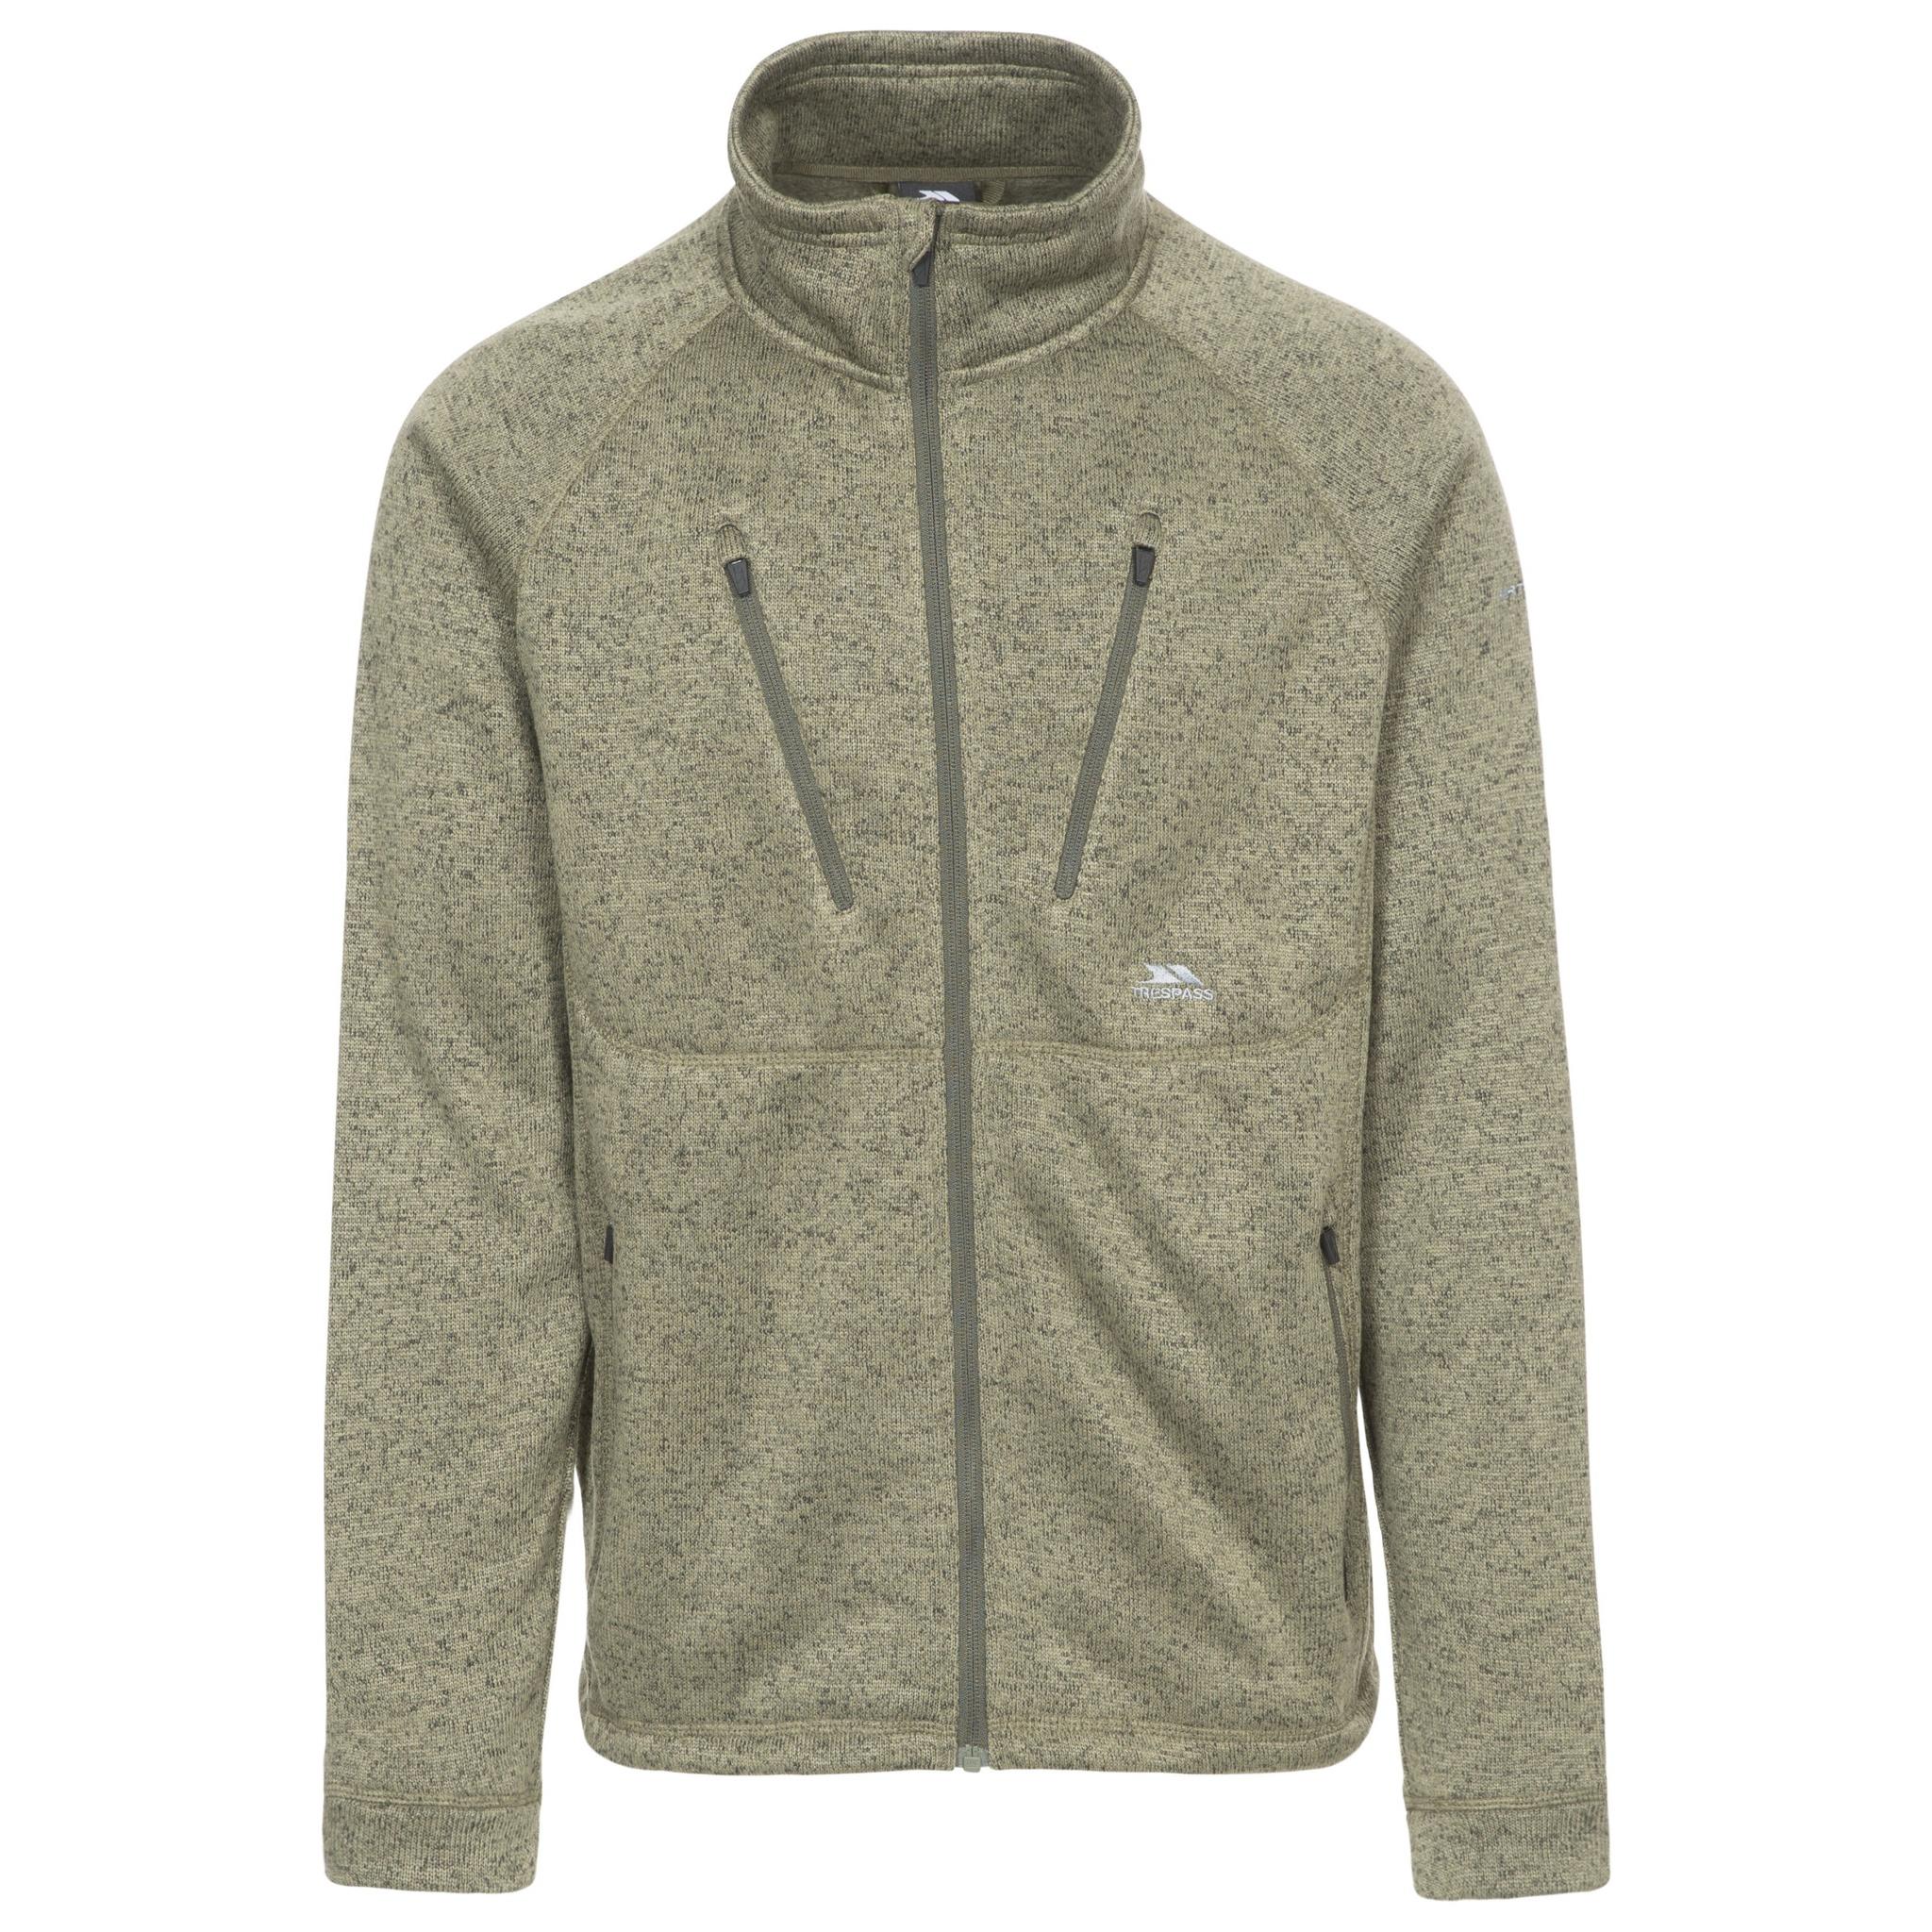 Trespass Mens Ramp Full Zip Fleece Jacket (S) (Moss Marl)